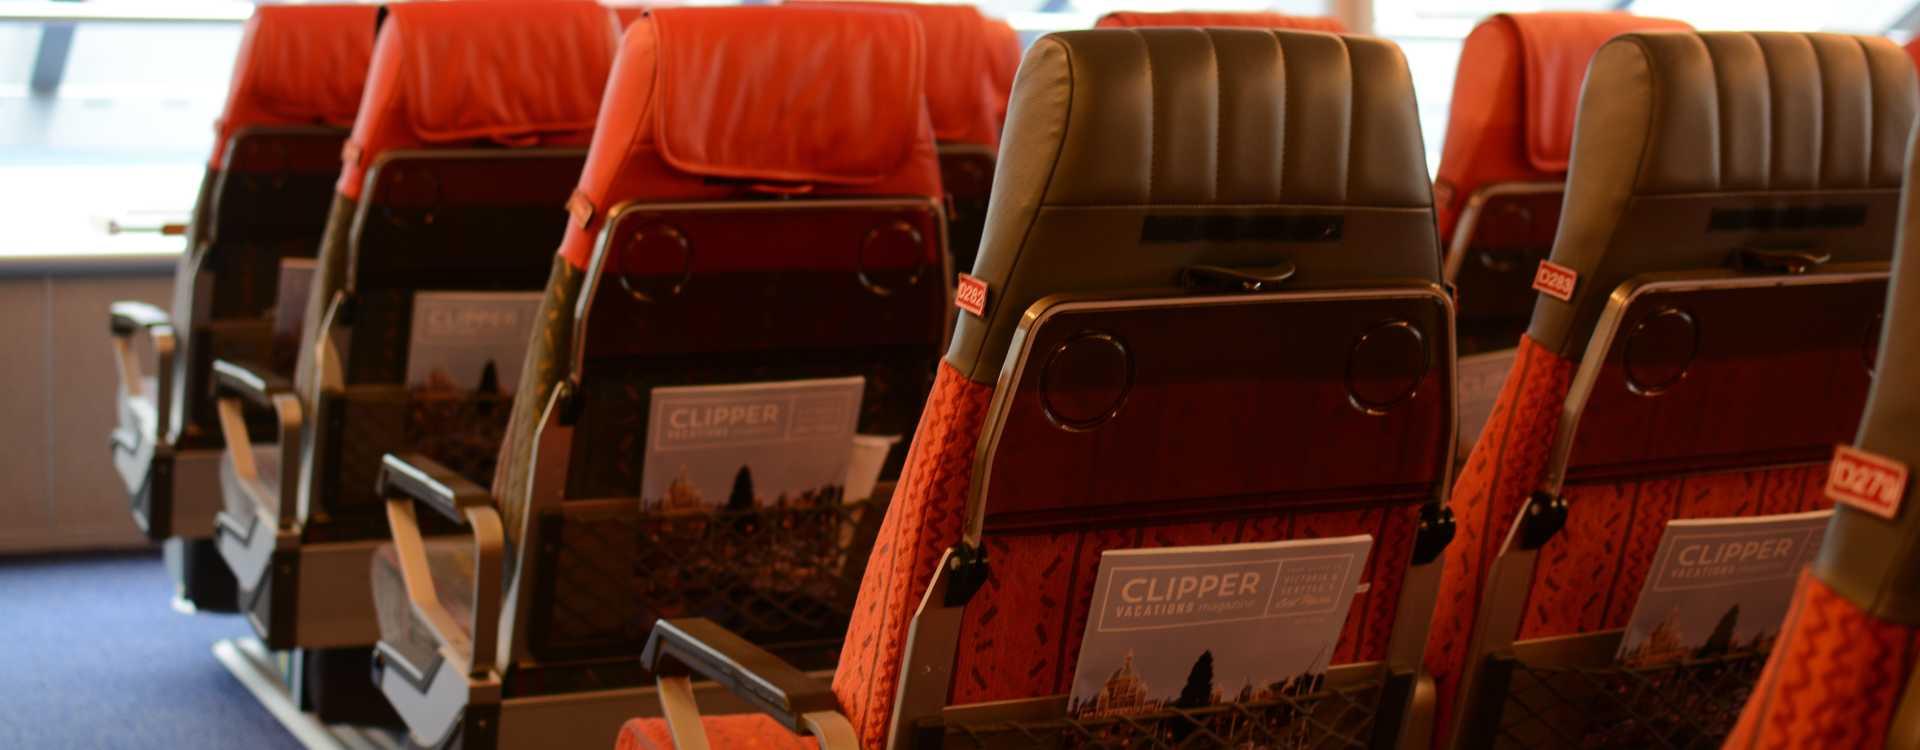 ClipperV_Comfort Class